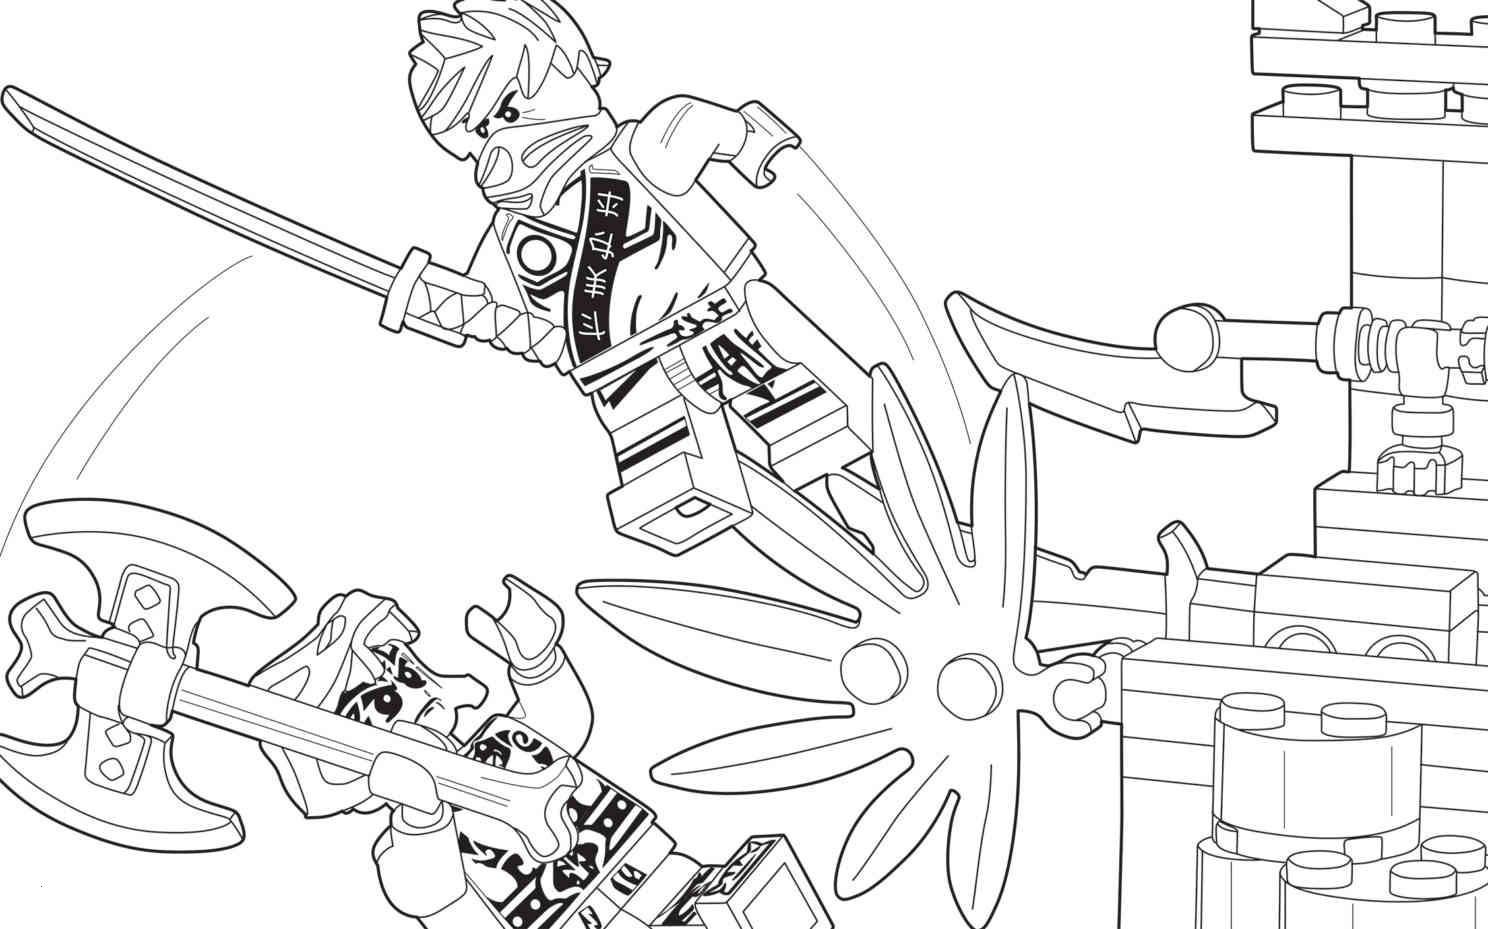 Ausmalbild Ninjago Lloyd Das Beste Von Ninjago Malvorlagen Zum Ausdrucken Schön 37 Lego Ninjago Lloyd Galerie